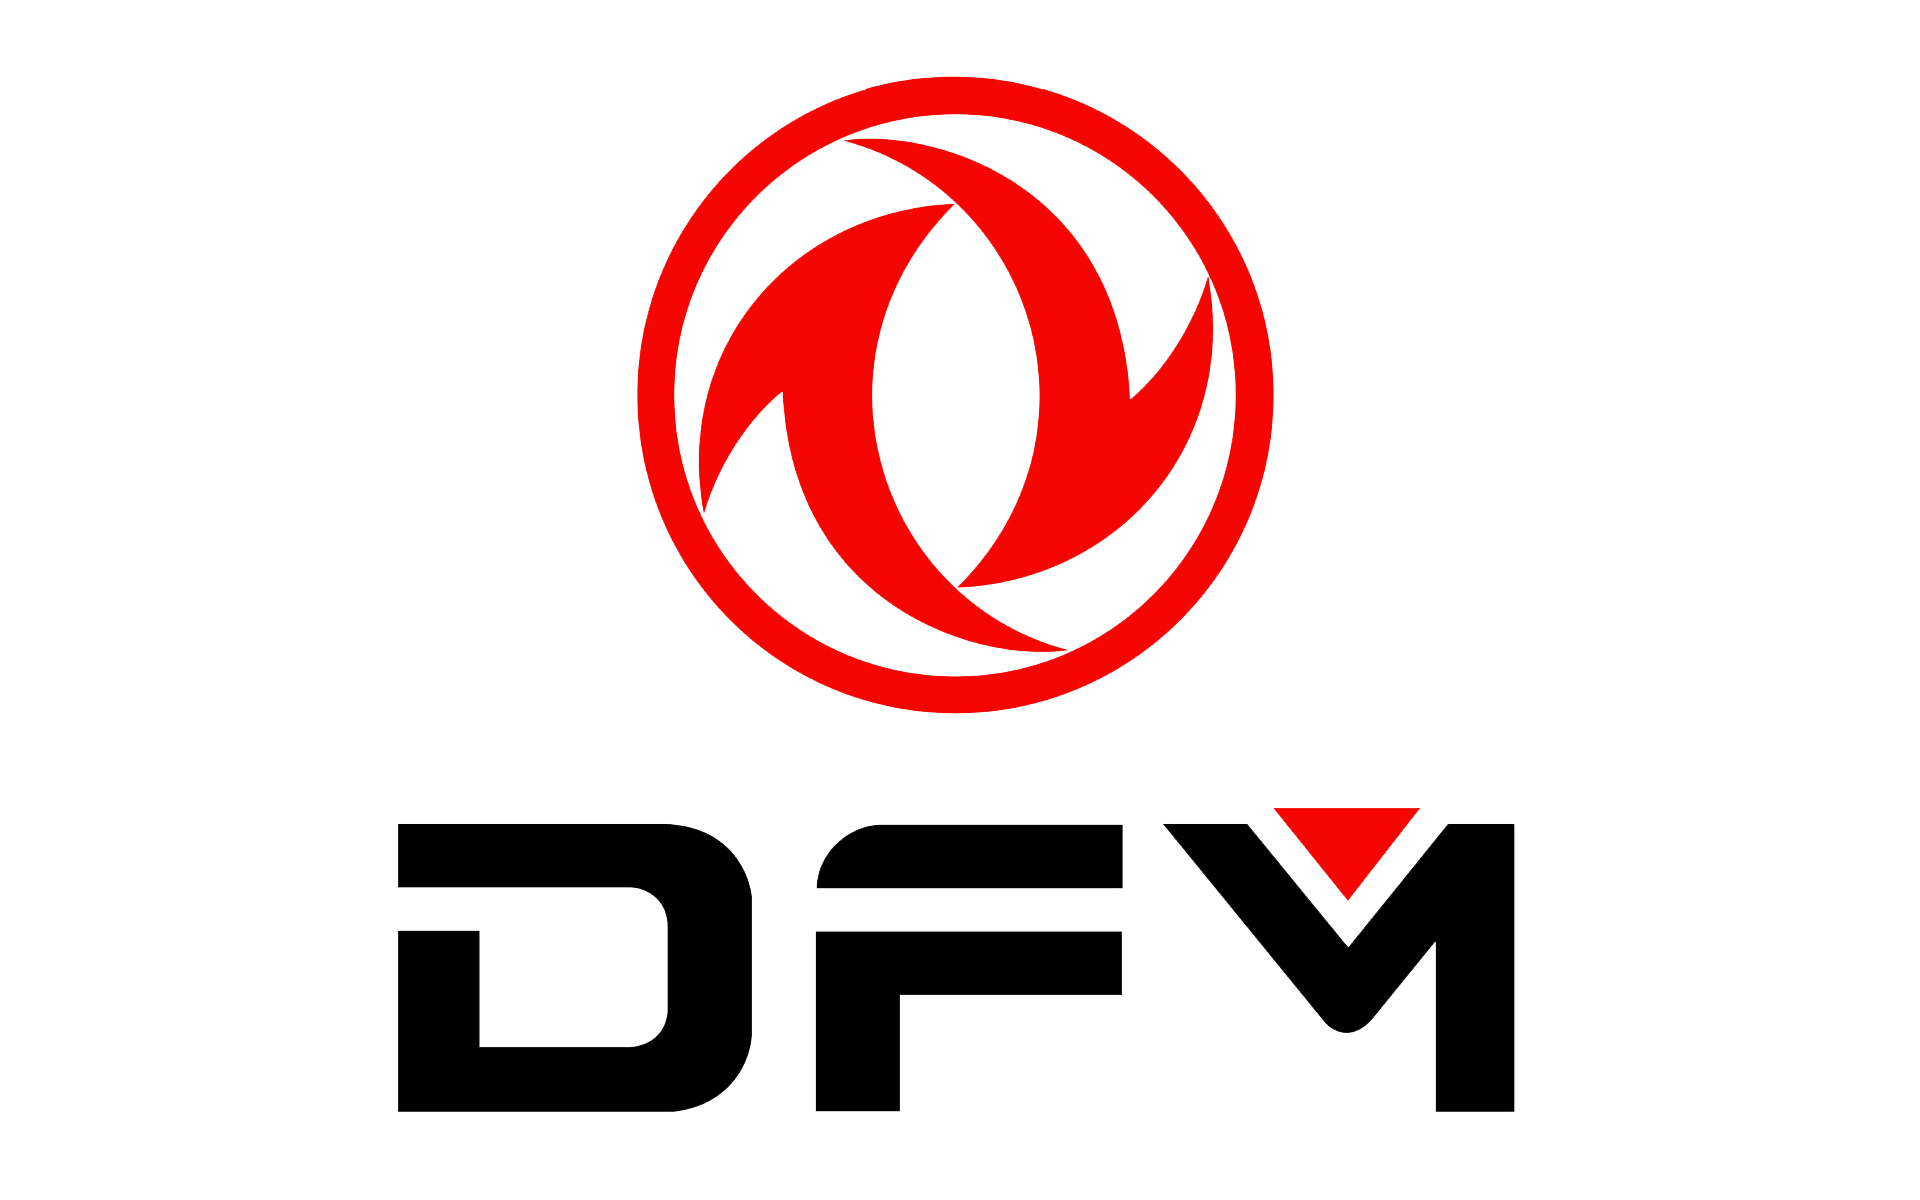 Dongfeng (DFM) Logo 1920x1200 HD Png - Dongfeng PNG